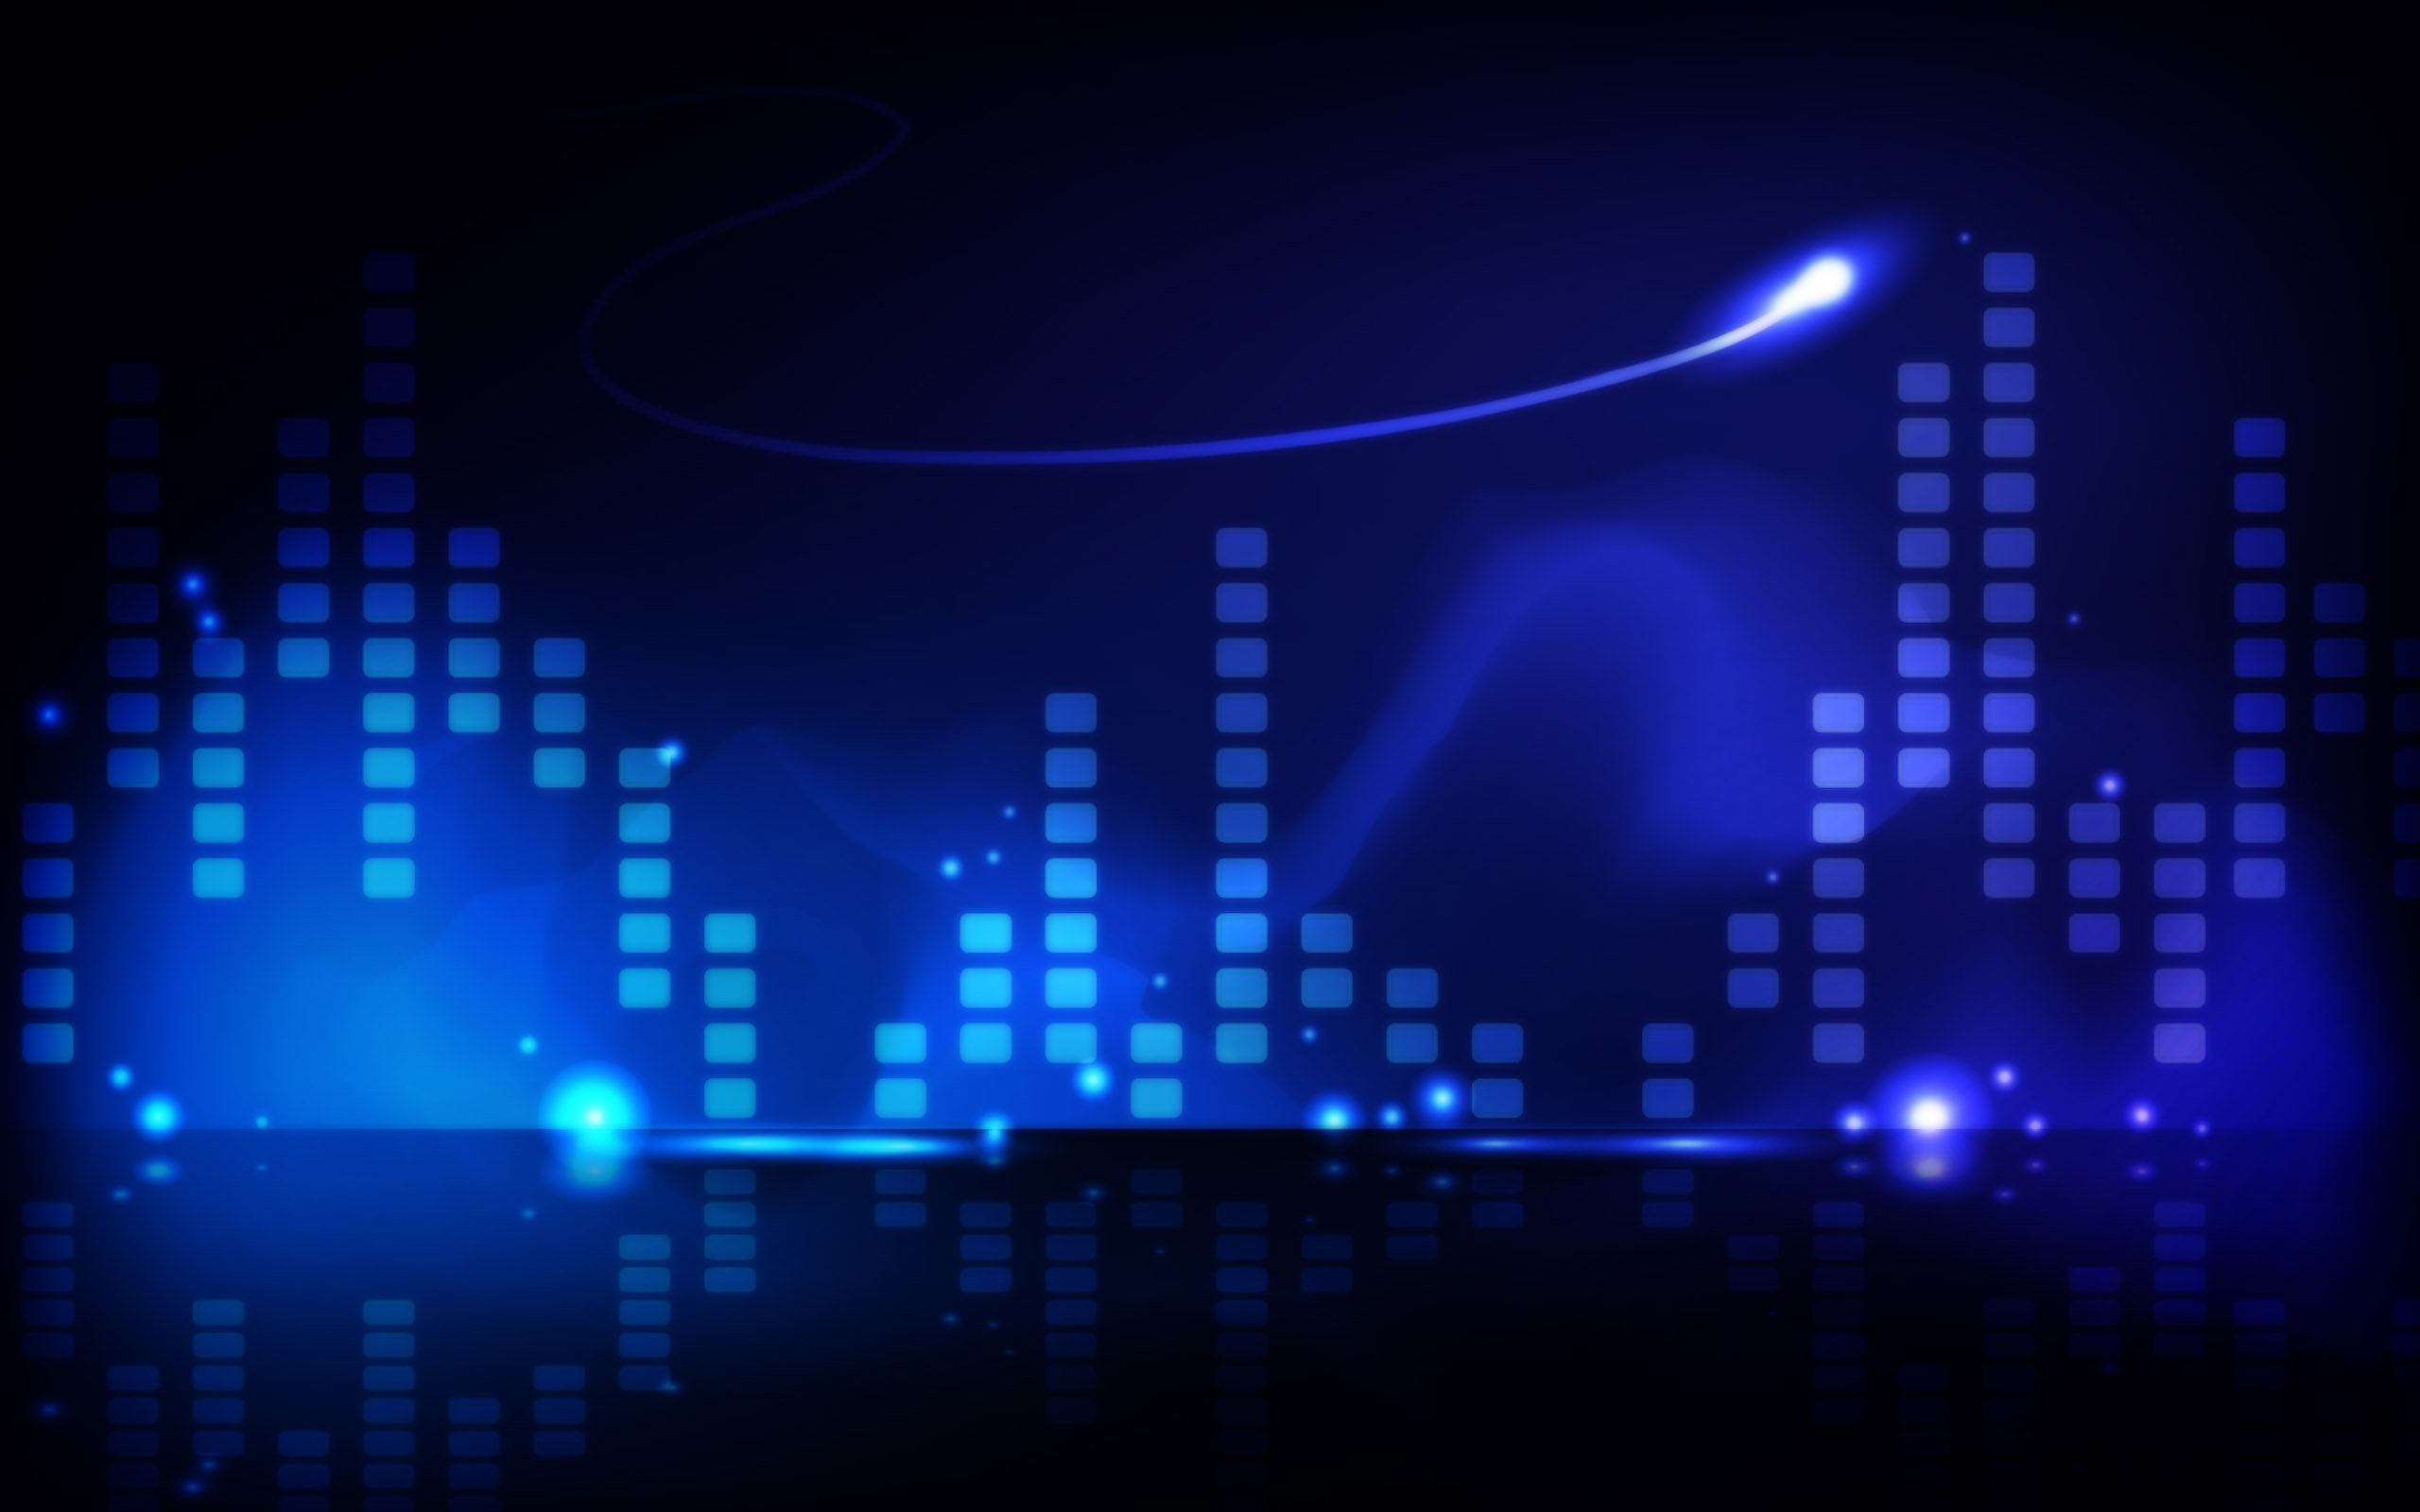 Download UltraMixer DJ software for Mac or